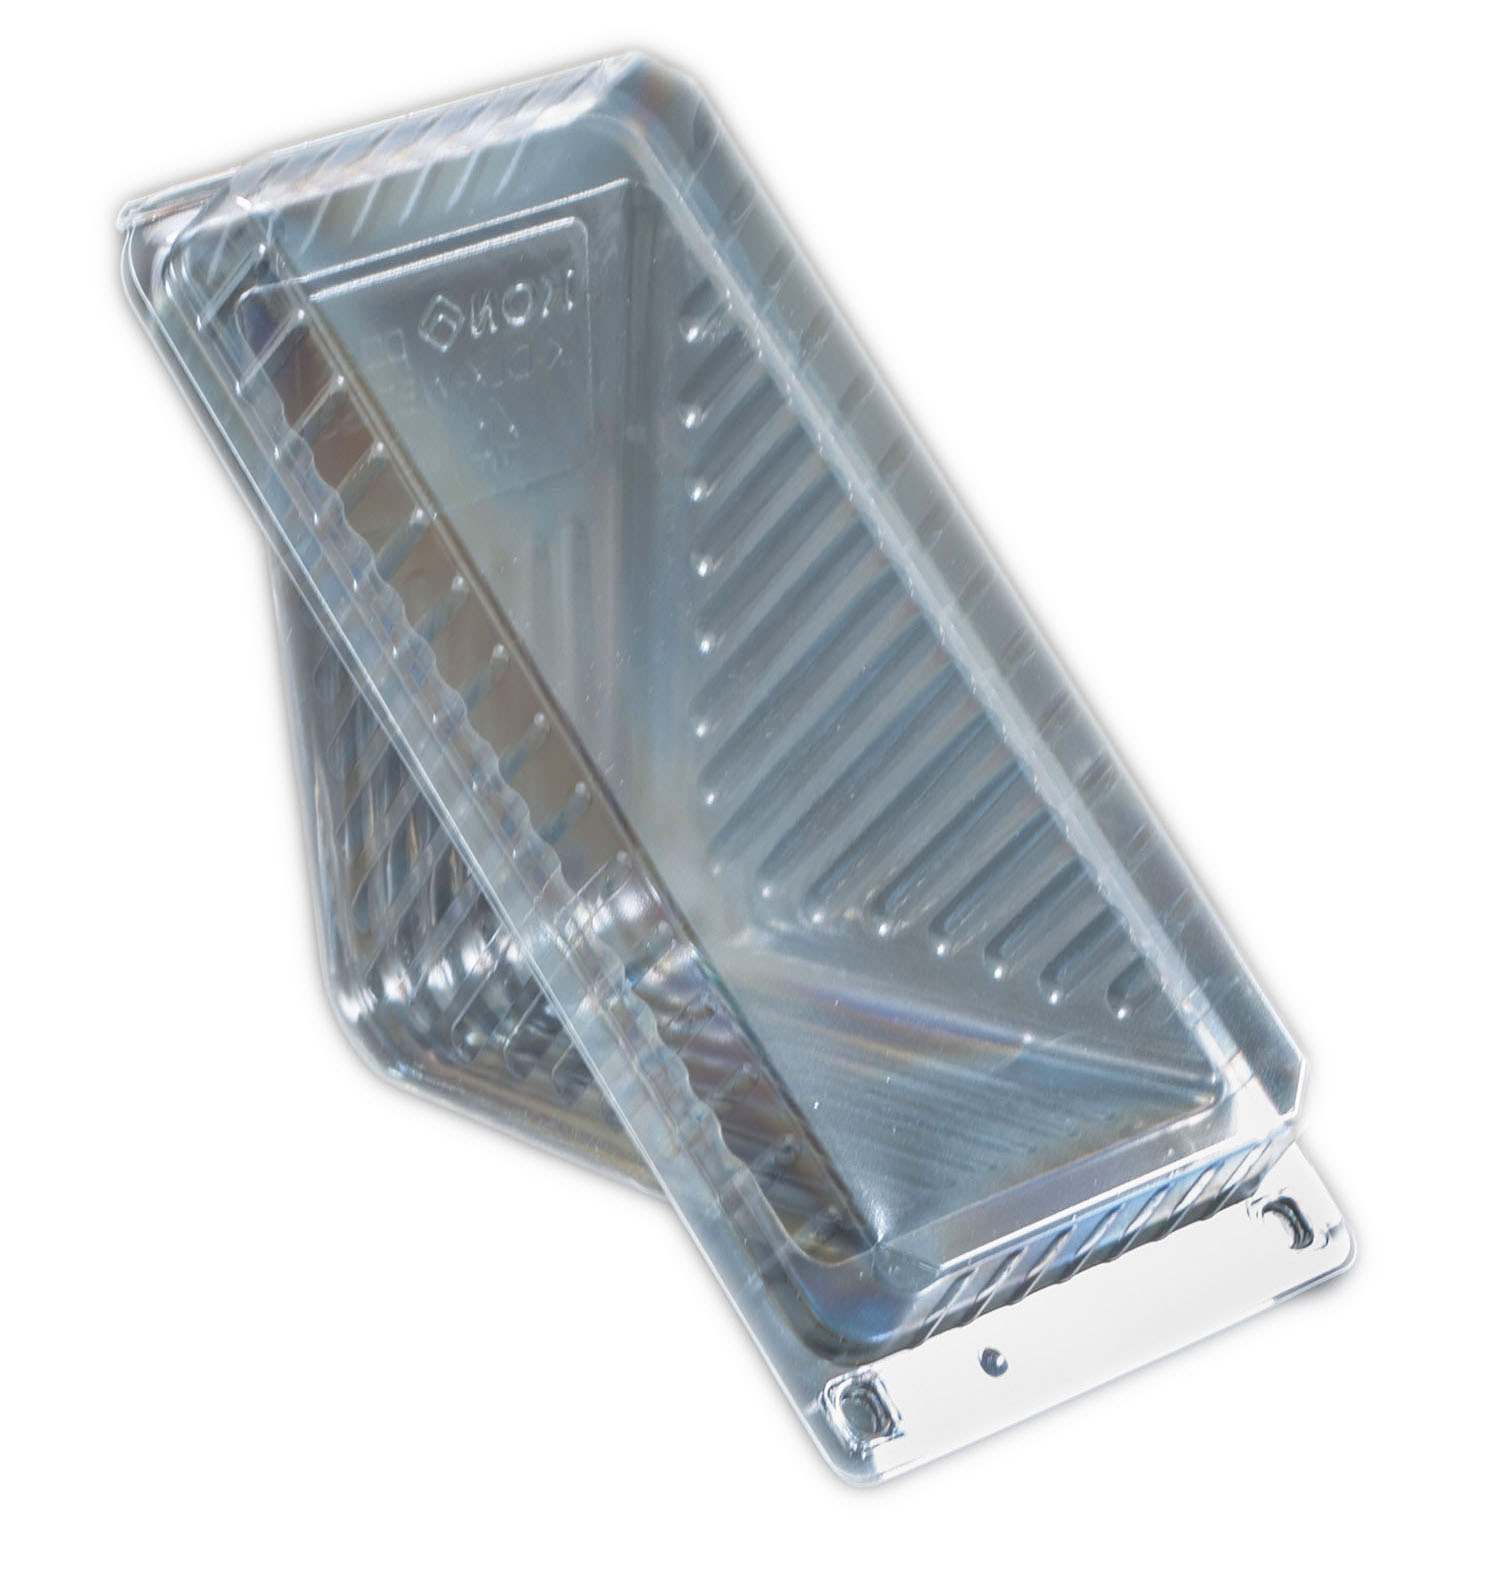 iK-LGE-WEDGE Large Sandwich Wedge   83 x 158 x 75 mm  125 per slv 500 per carton